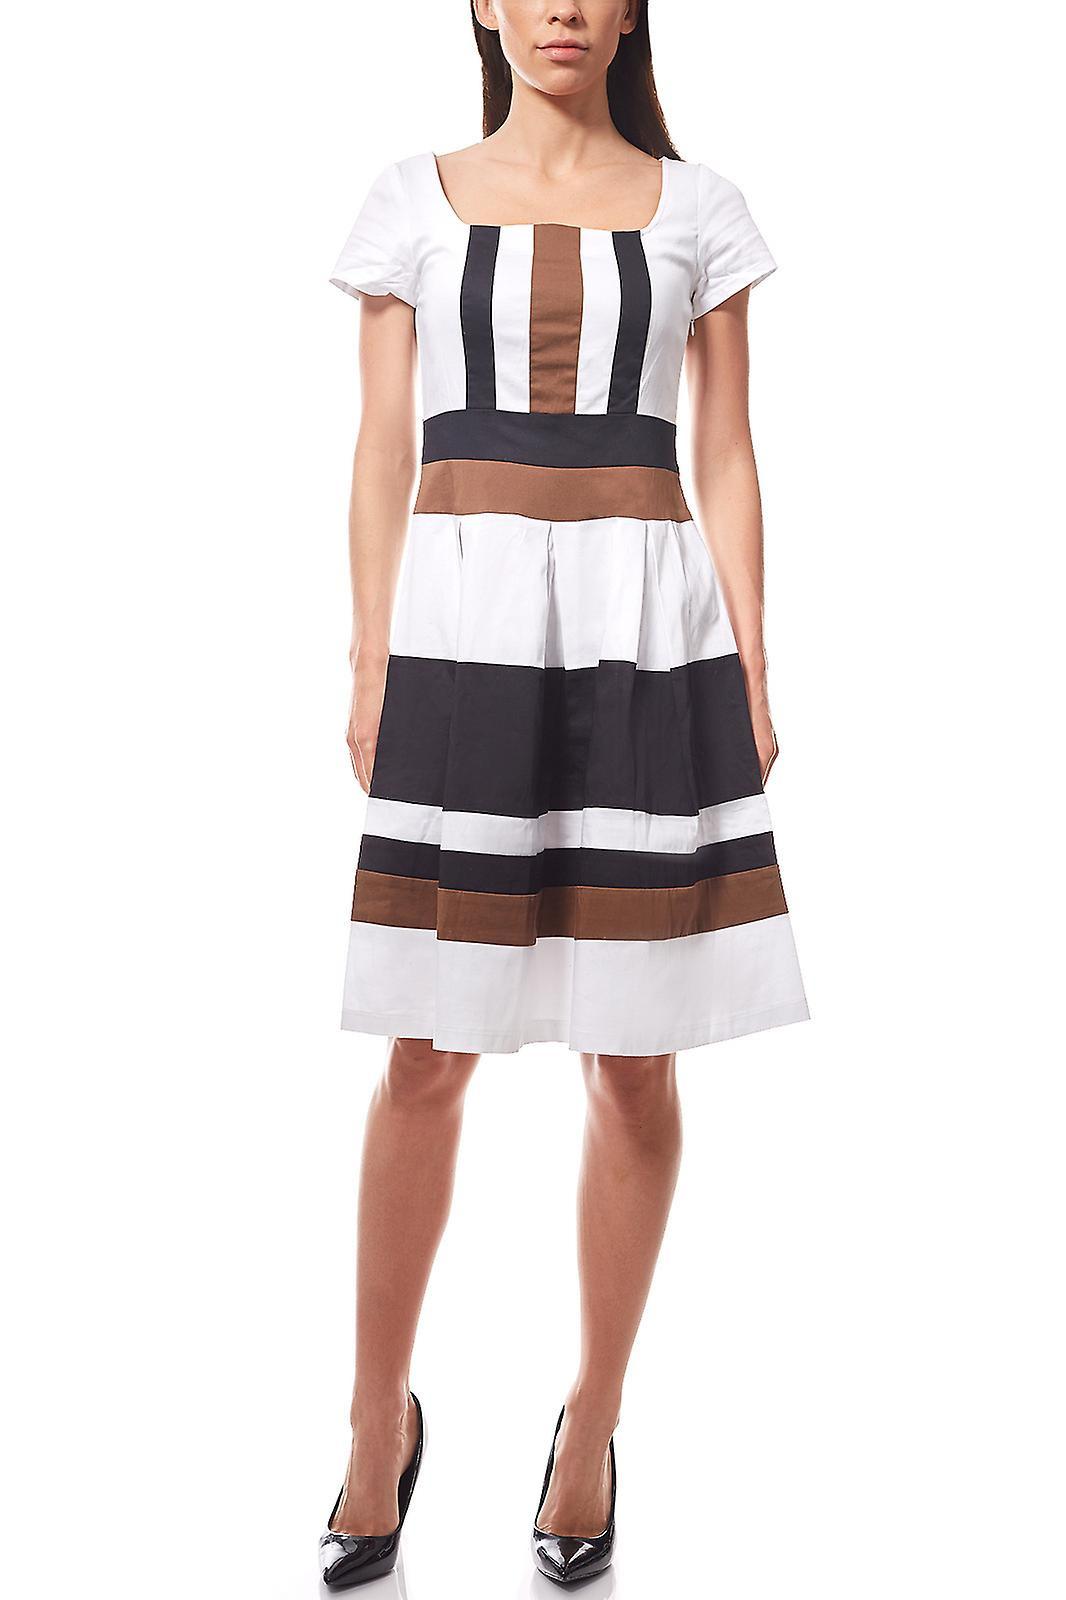 Formal Coolste Kleid Gestreift Spezialgebiet Luxus Kleid Gestreift Ärmel